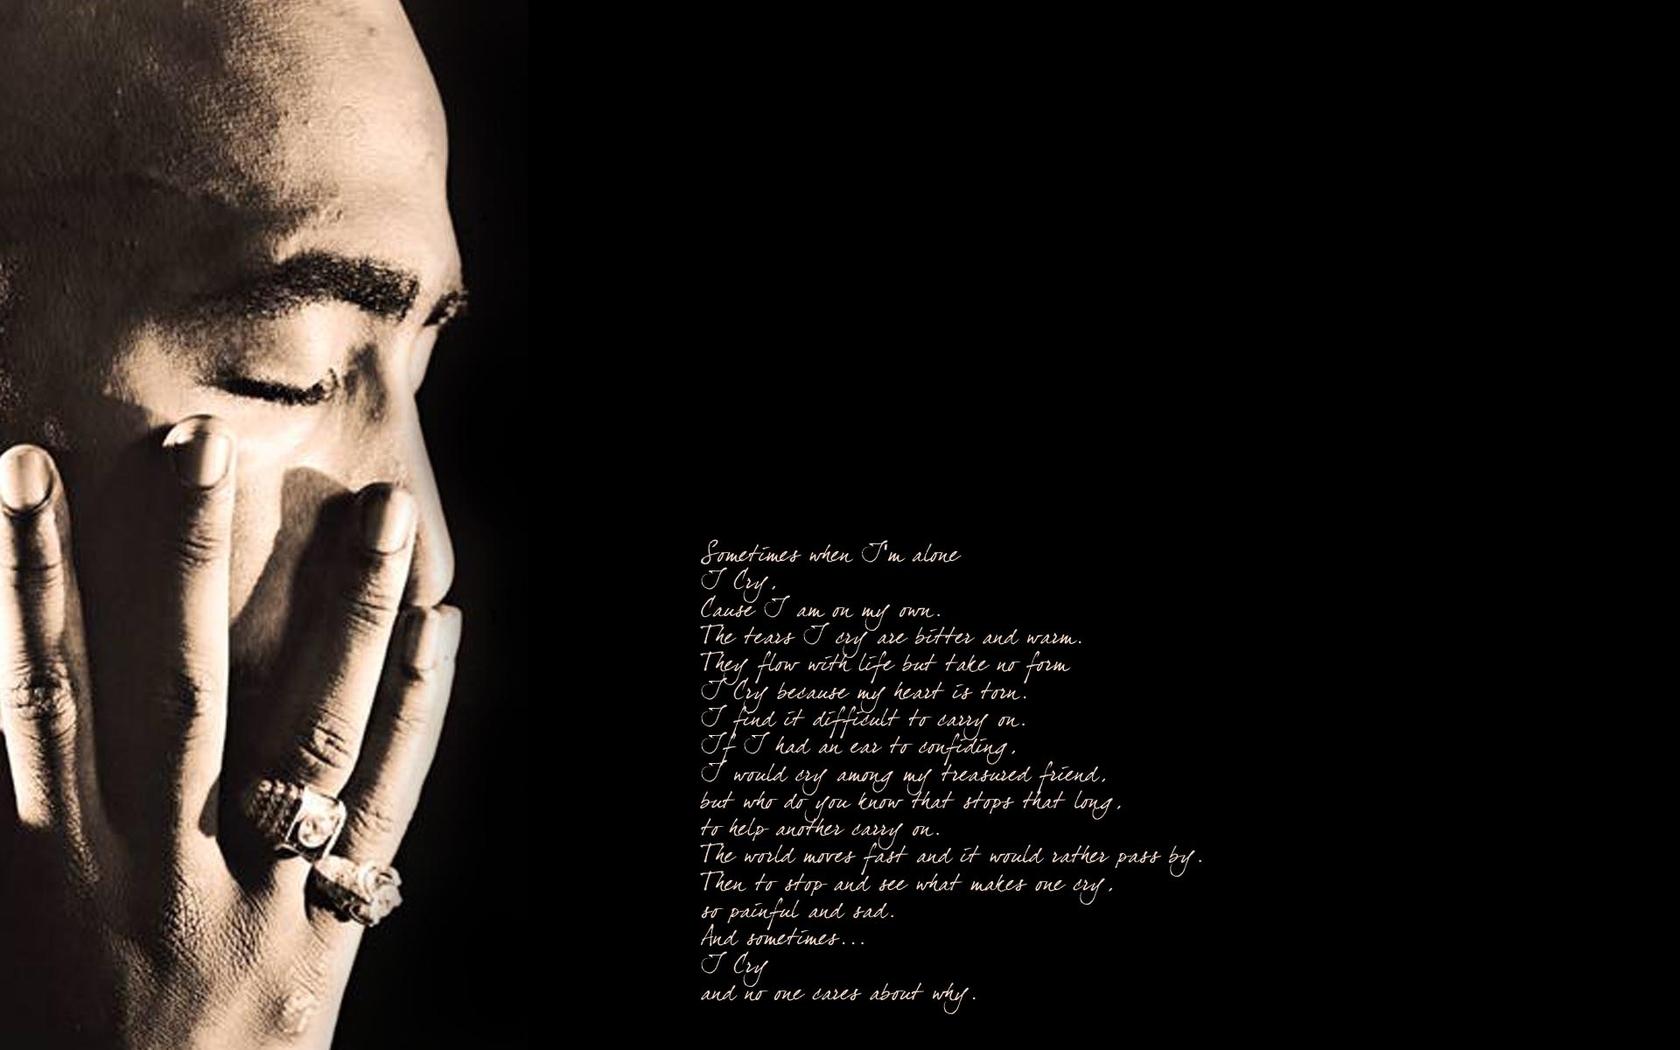 Download Tupac Shakur quote wallpaper 1680x1050